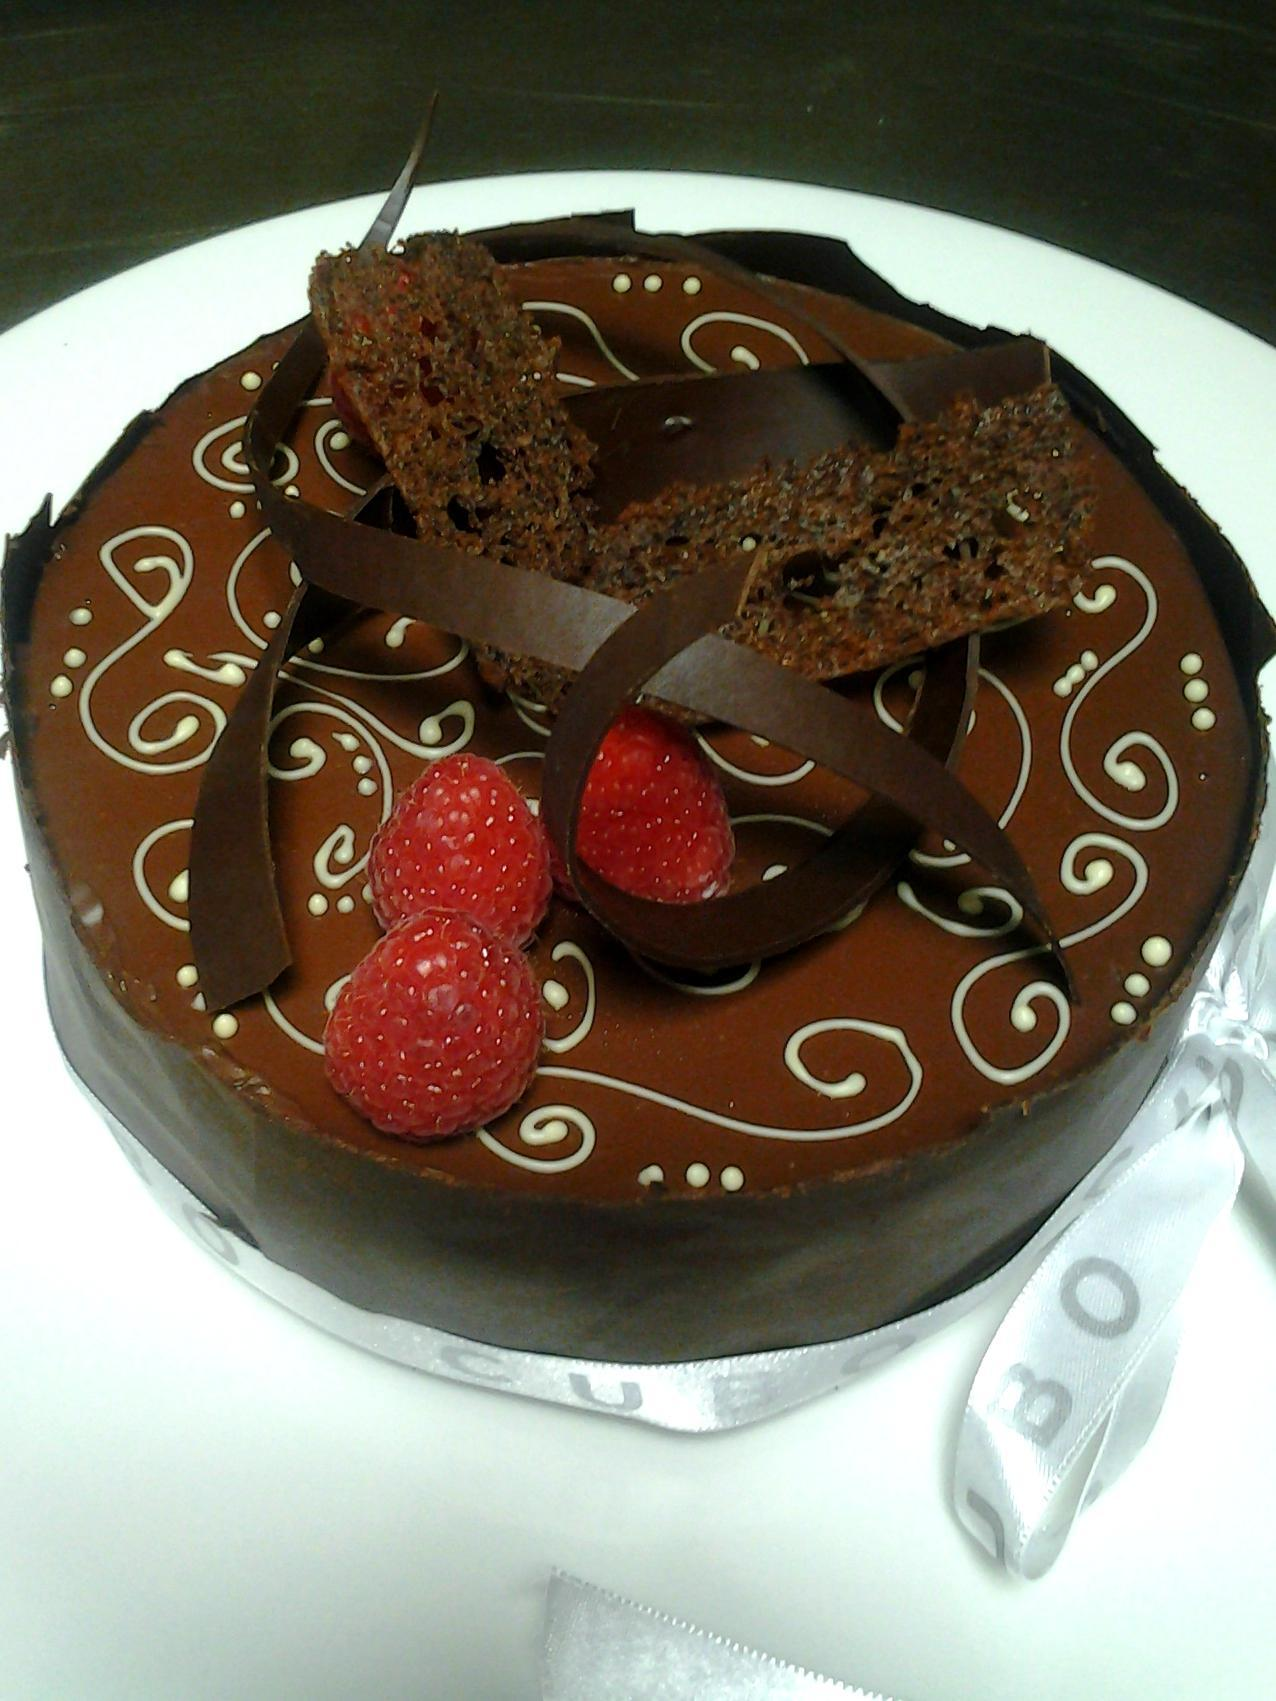 Miraculous Birthday Cake Hotel Cubo Funny Birthday Cards Online Sheoxdamsfinfo